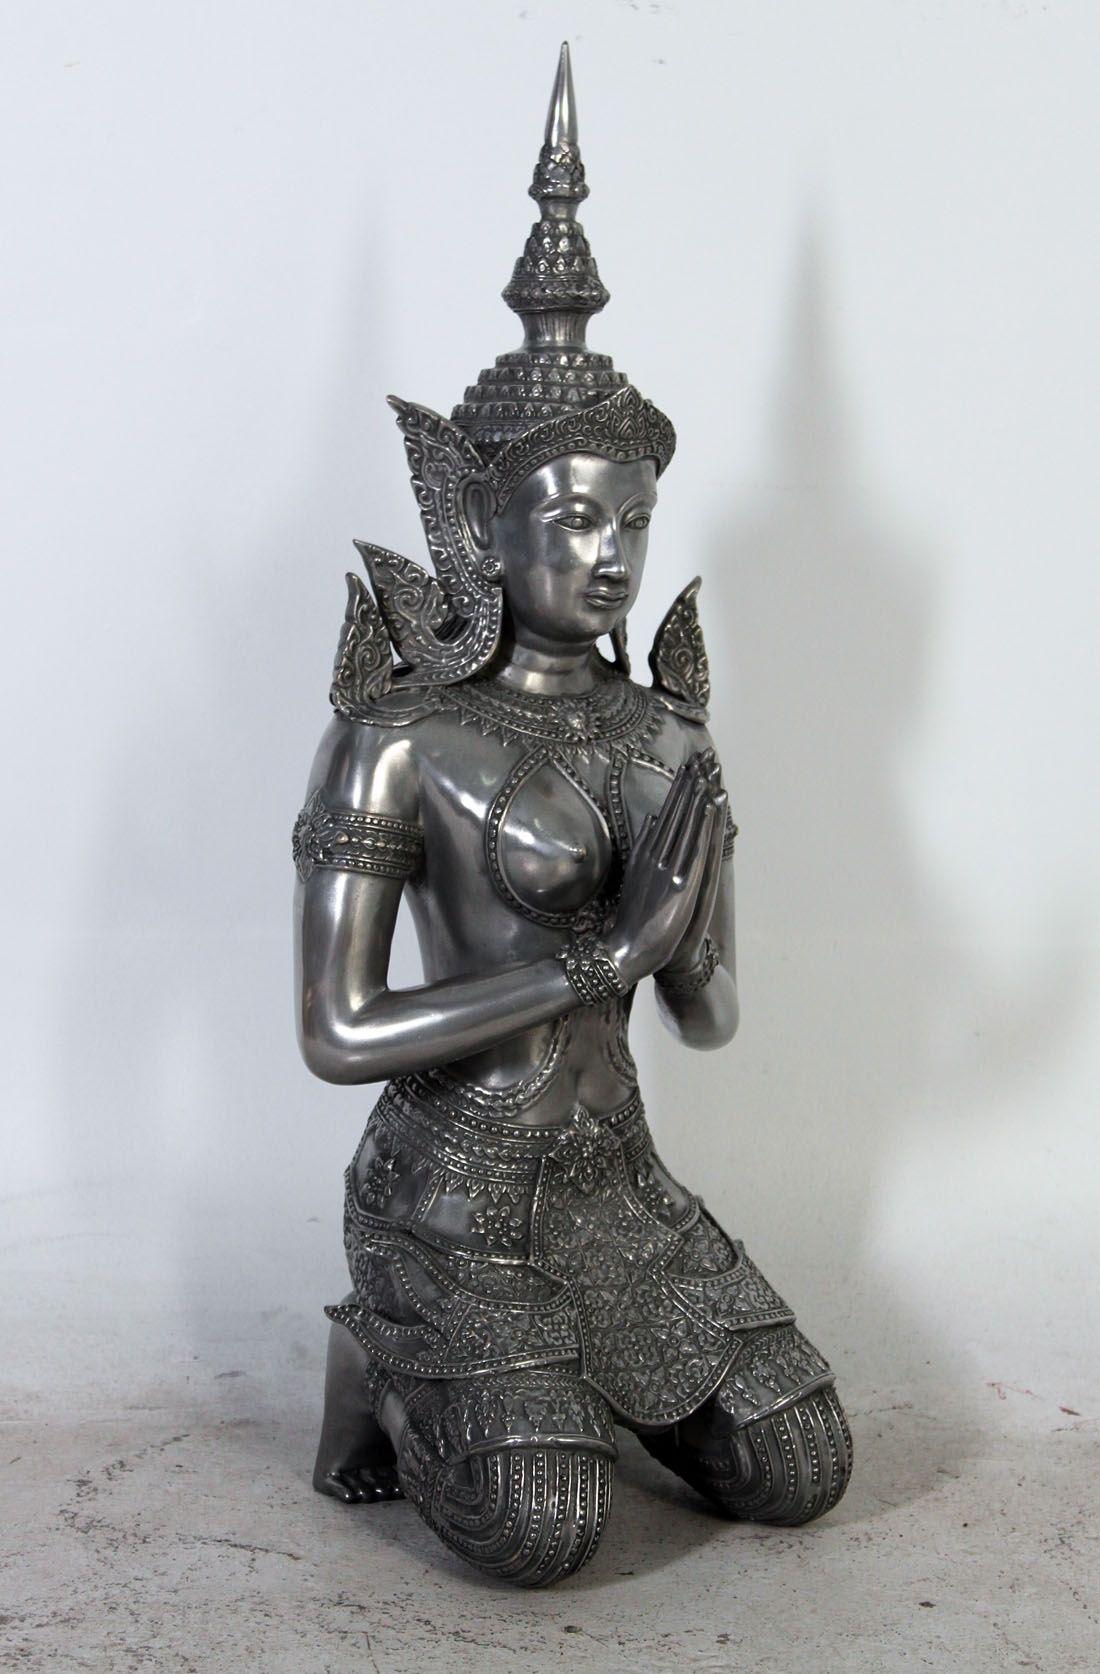 Aliexpress.com : Buy China Old Tibet Tibetan Buddhism tara